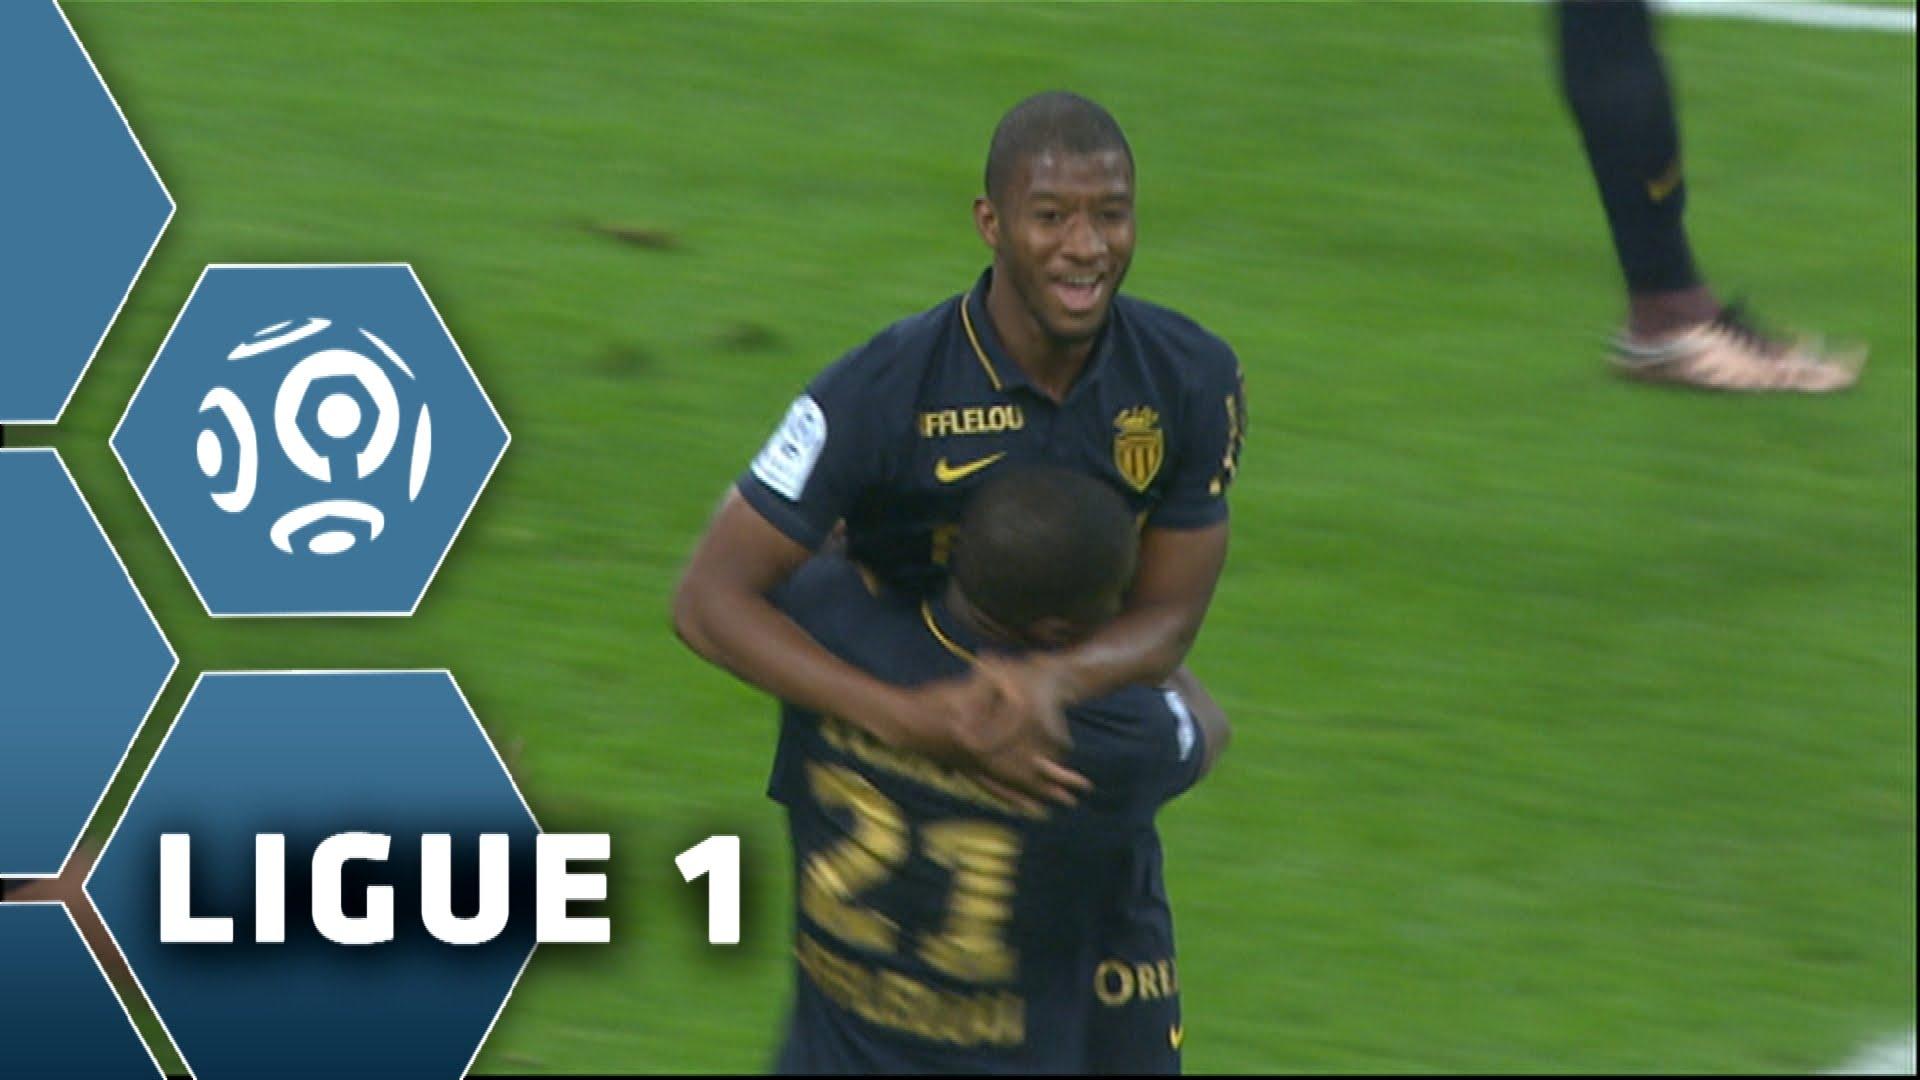 Ponturi pariuri Rennes vs Marseille – Ligue 1